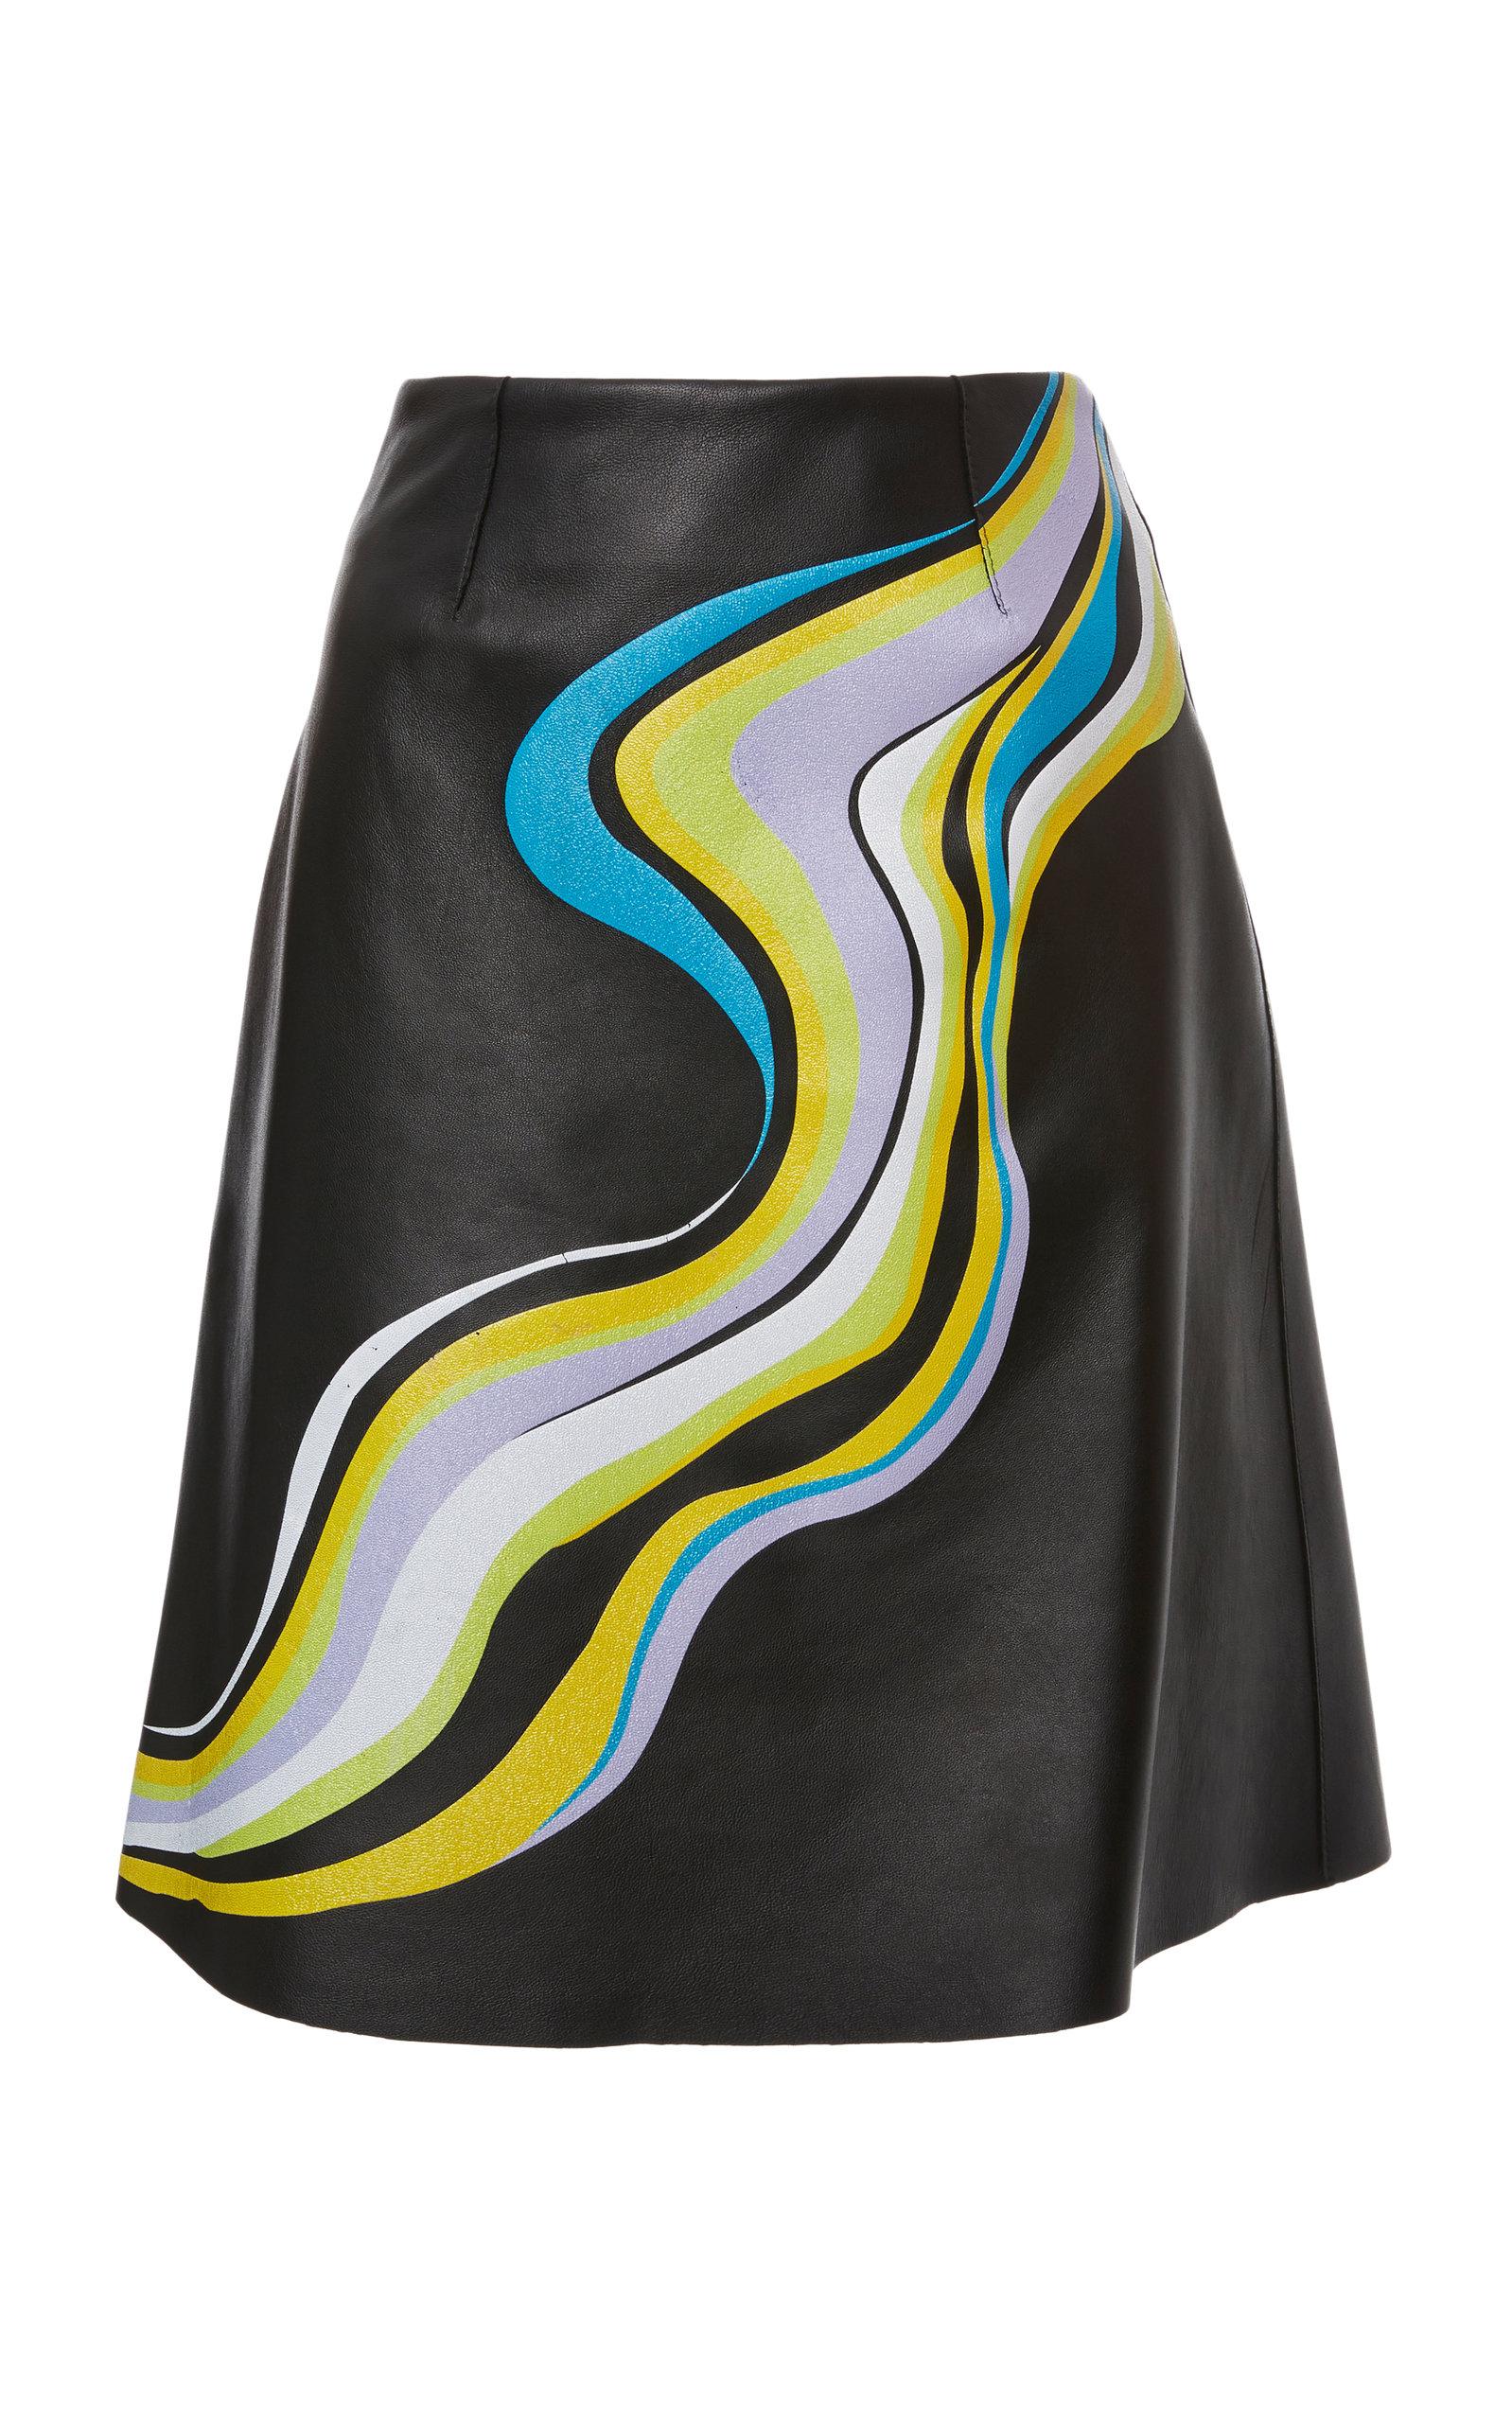 JEFFREY DODD Swirl Printed Circle Skirt